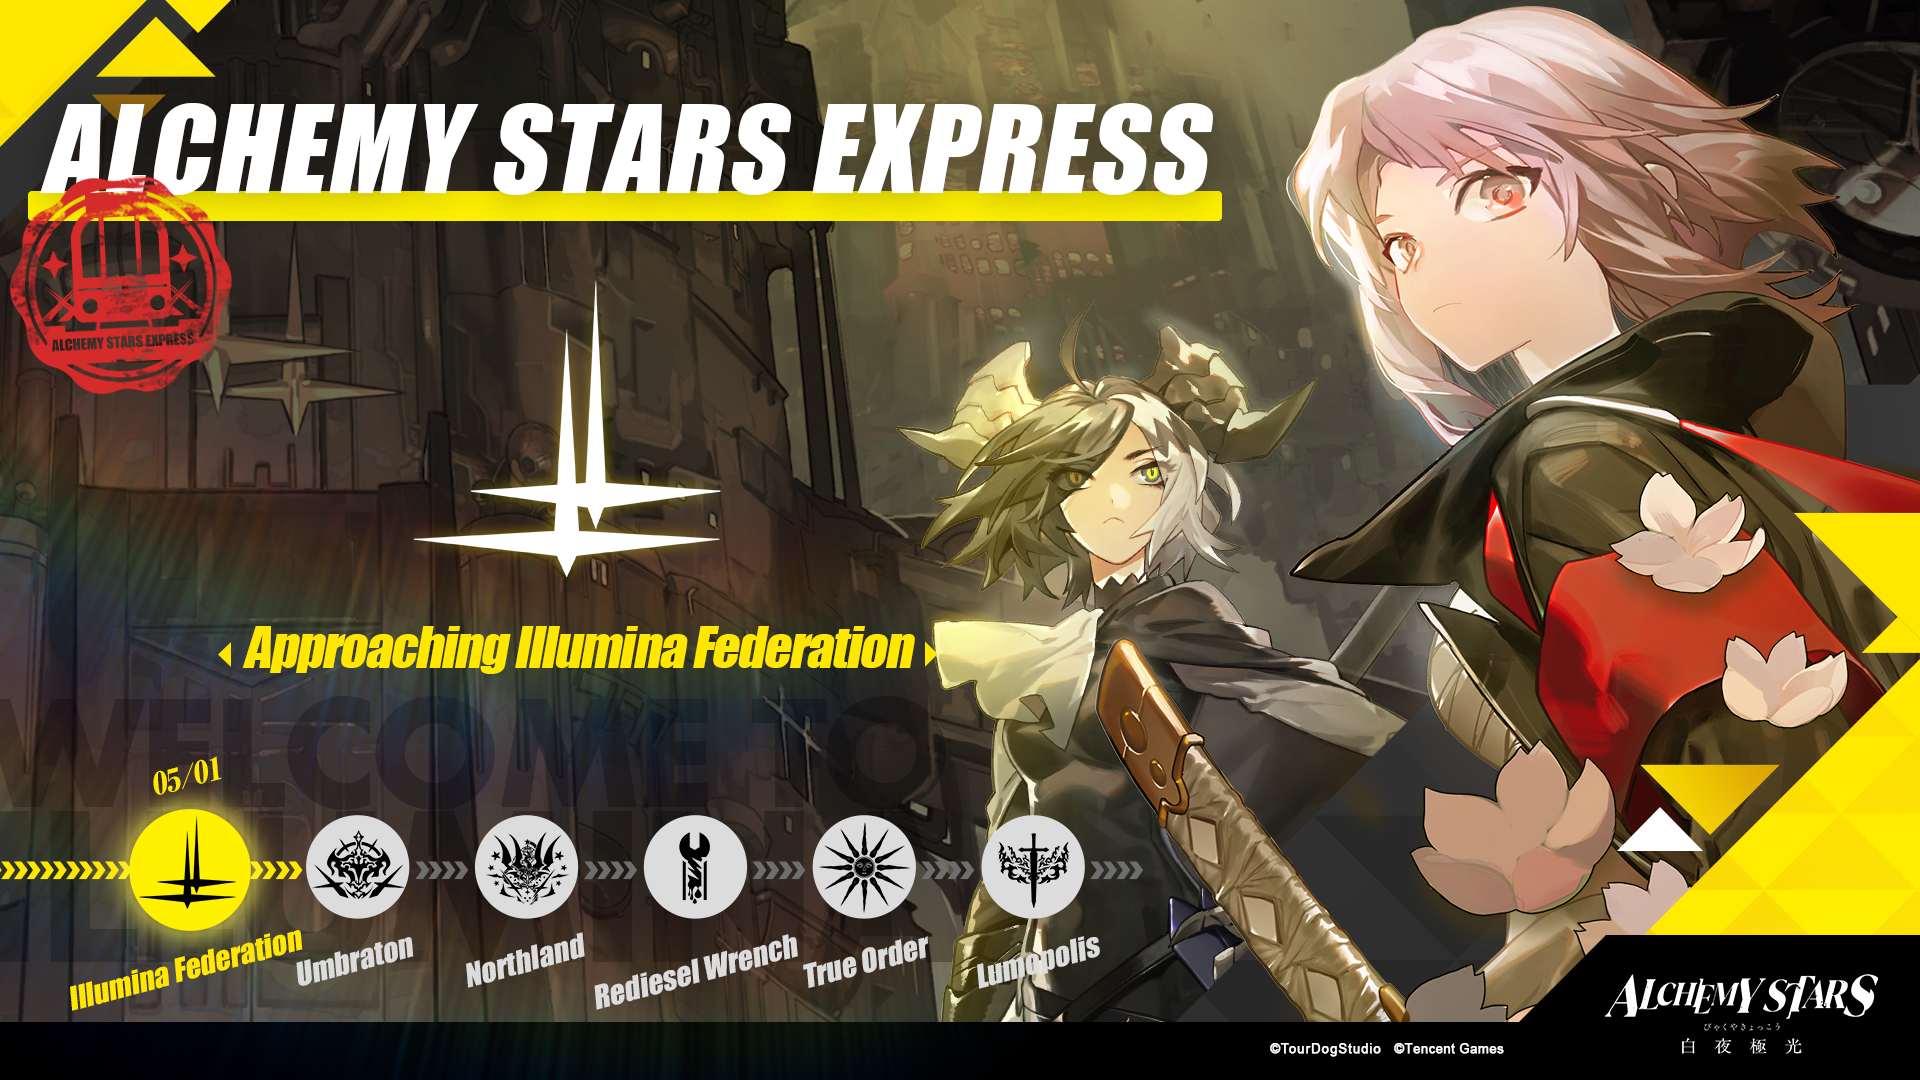 Alchemy Stars จัดกิจกรรมบน Twitter รับของรางวัลมากมาย พร้อมปล่อยตัวอย่างใหม่แนะนำฝ่าย Illumina Federation